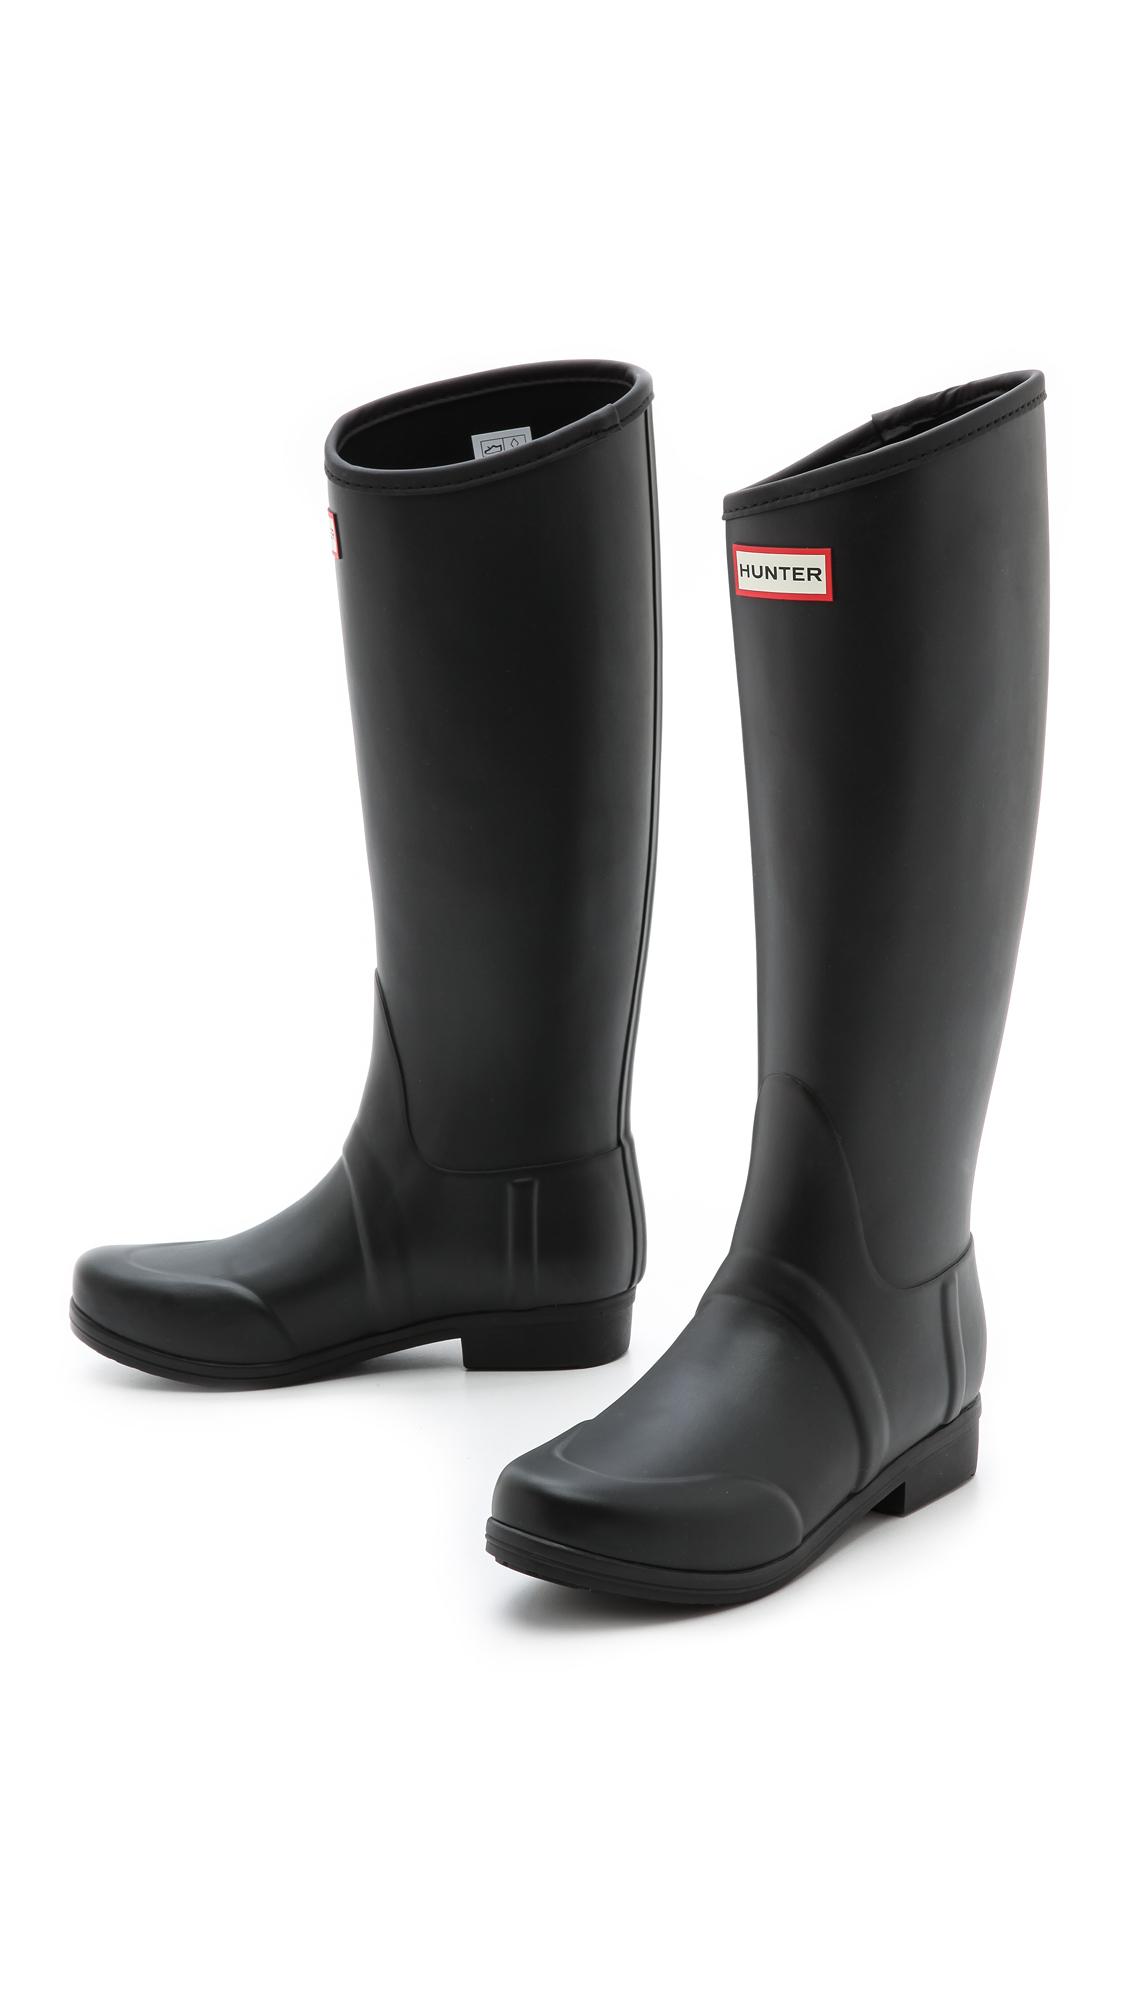 Hunter Equestrian Tall Boots Dark Chocolate in Black | Lyst